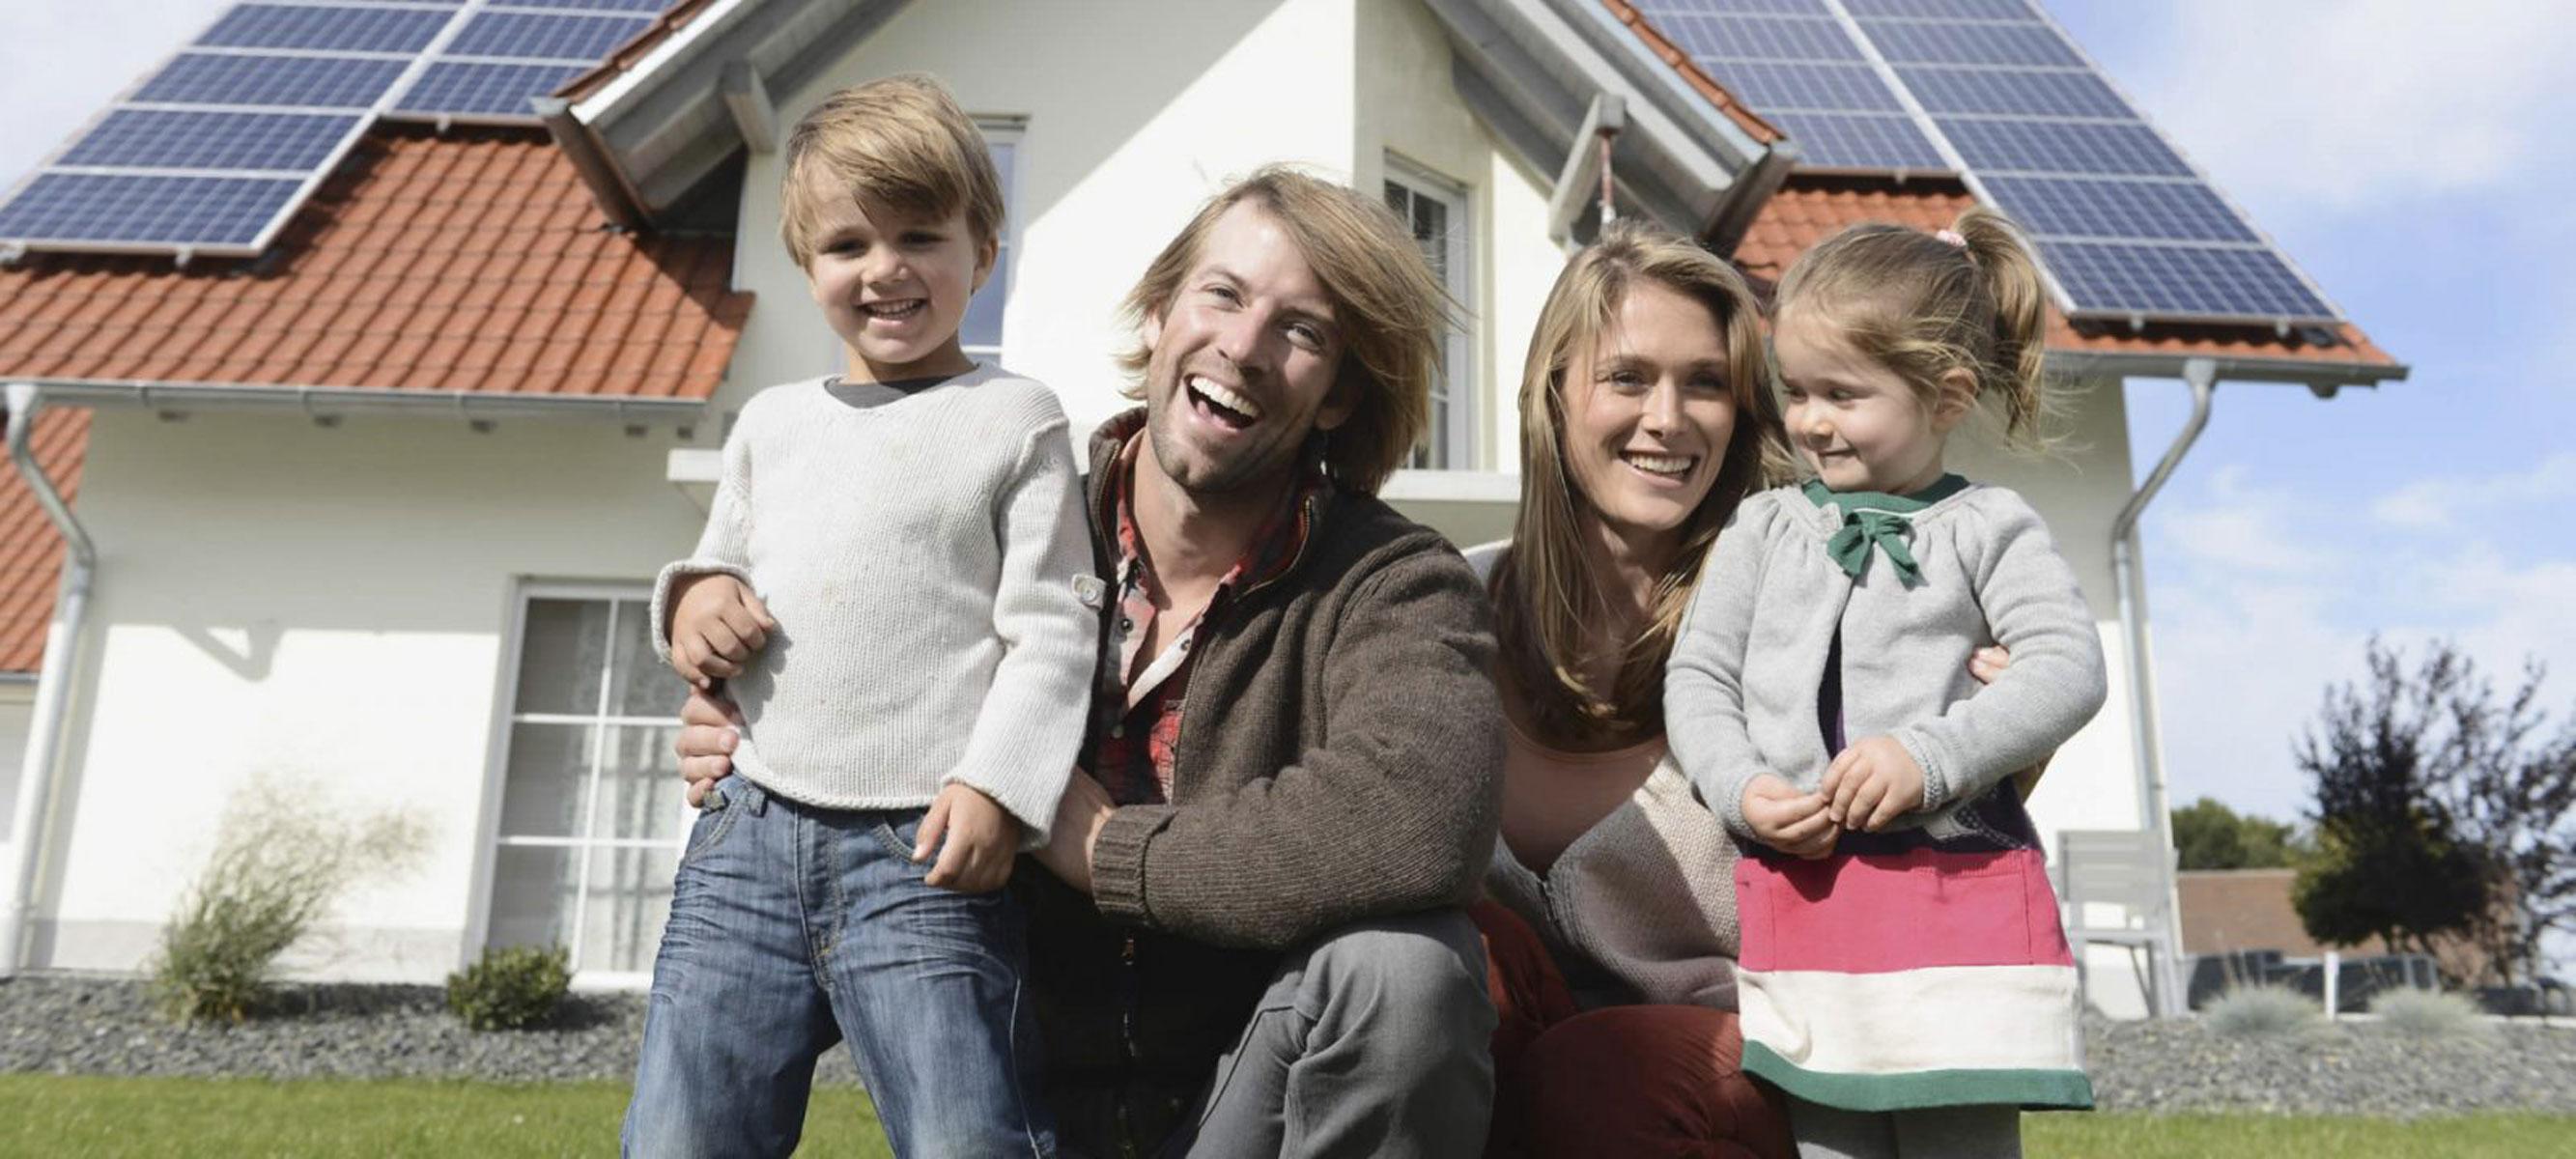 GoGreen Solar